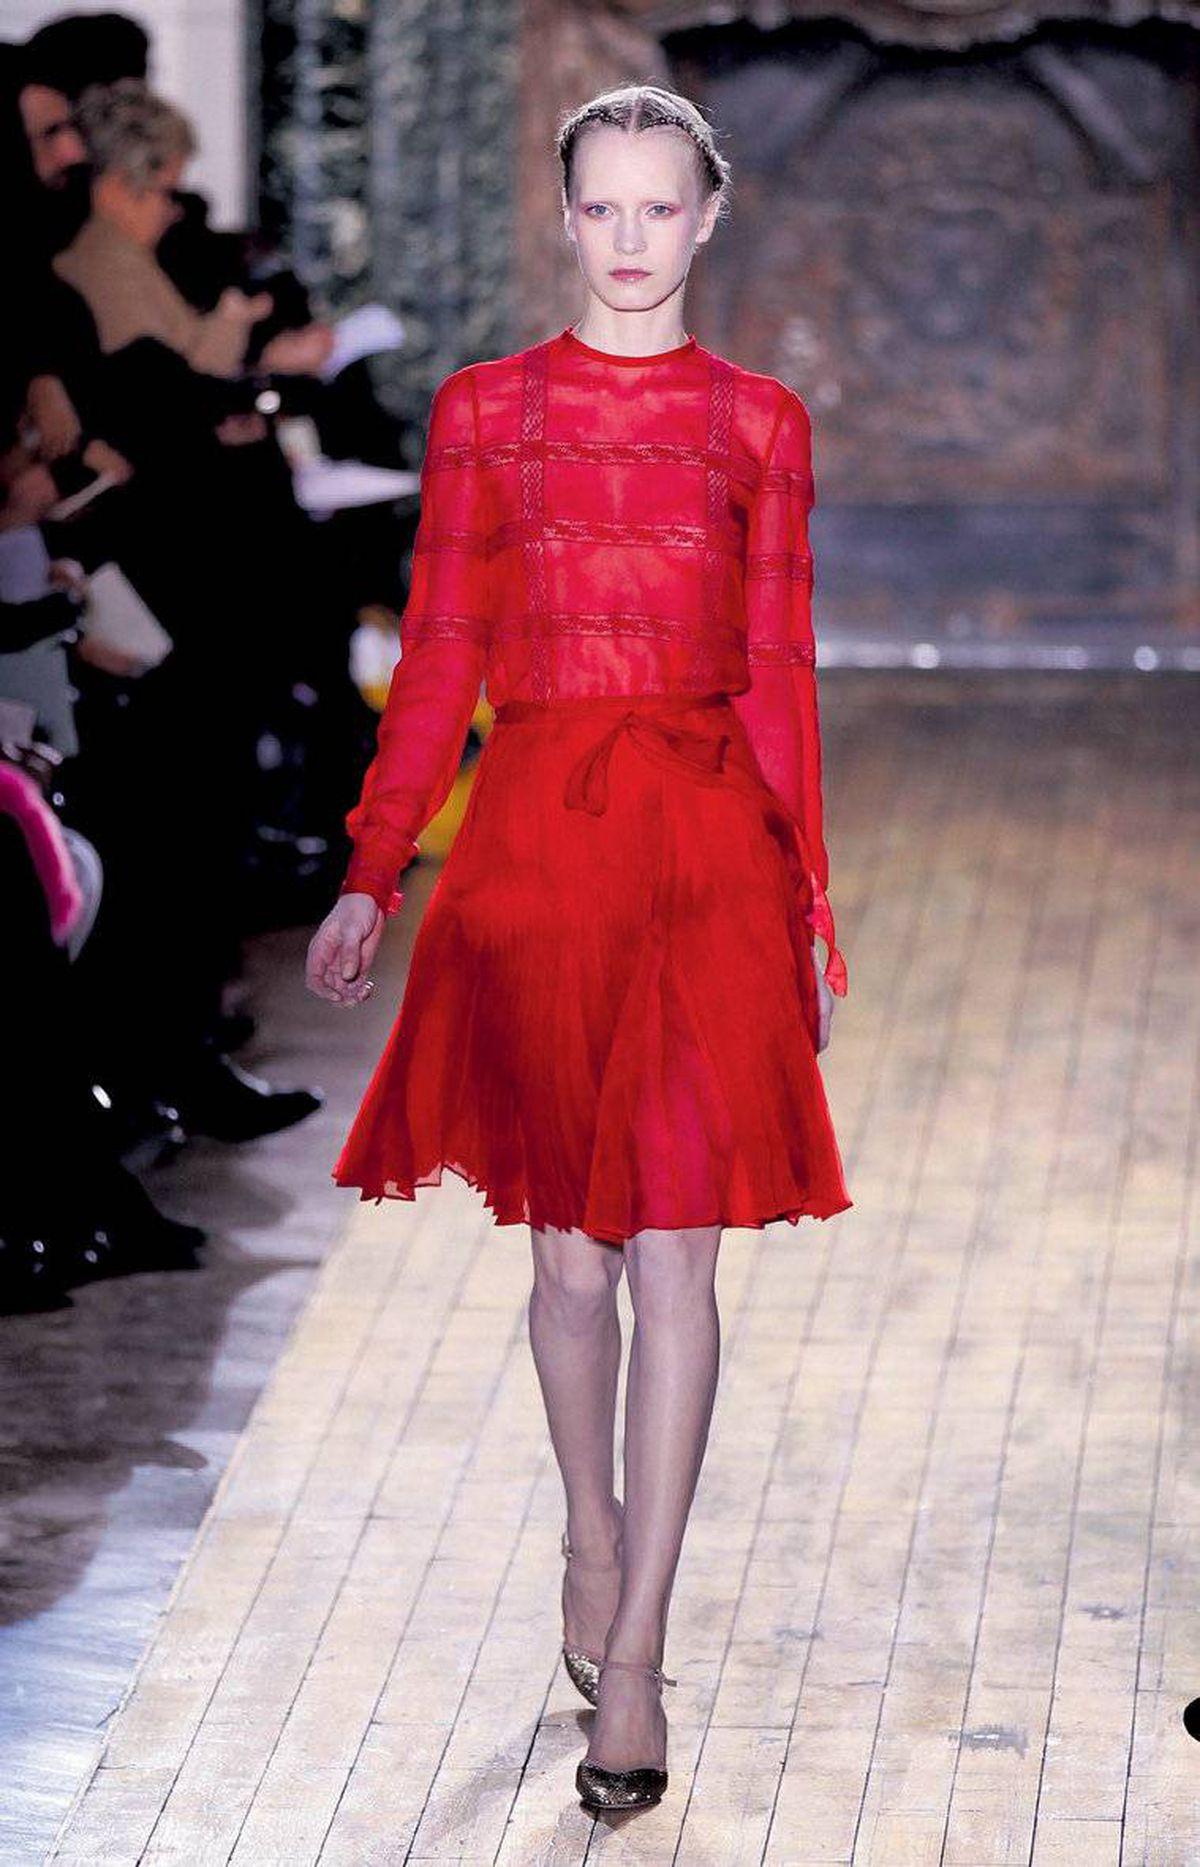 At Valentino, Maria Grazia Chiuri and Pier Paolo Piccioli showed ultra-feminine looks, including blush-toned ruffles and dresses in the label?s signature shade of red.